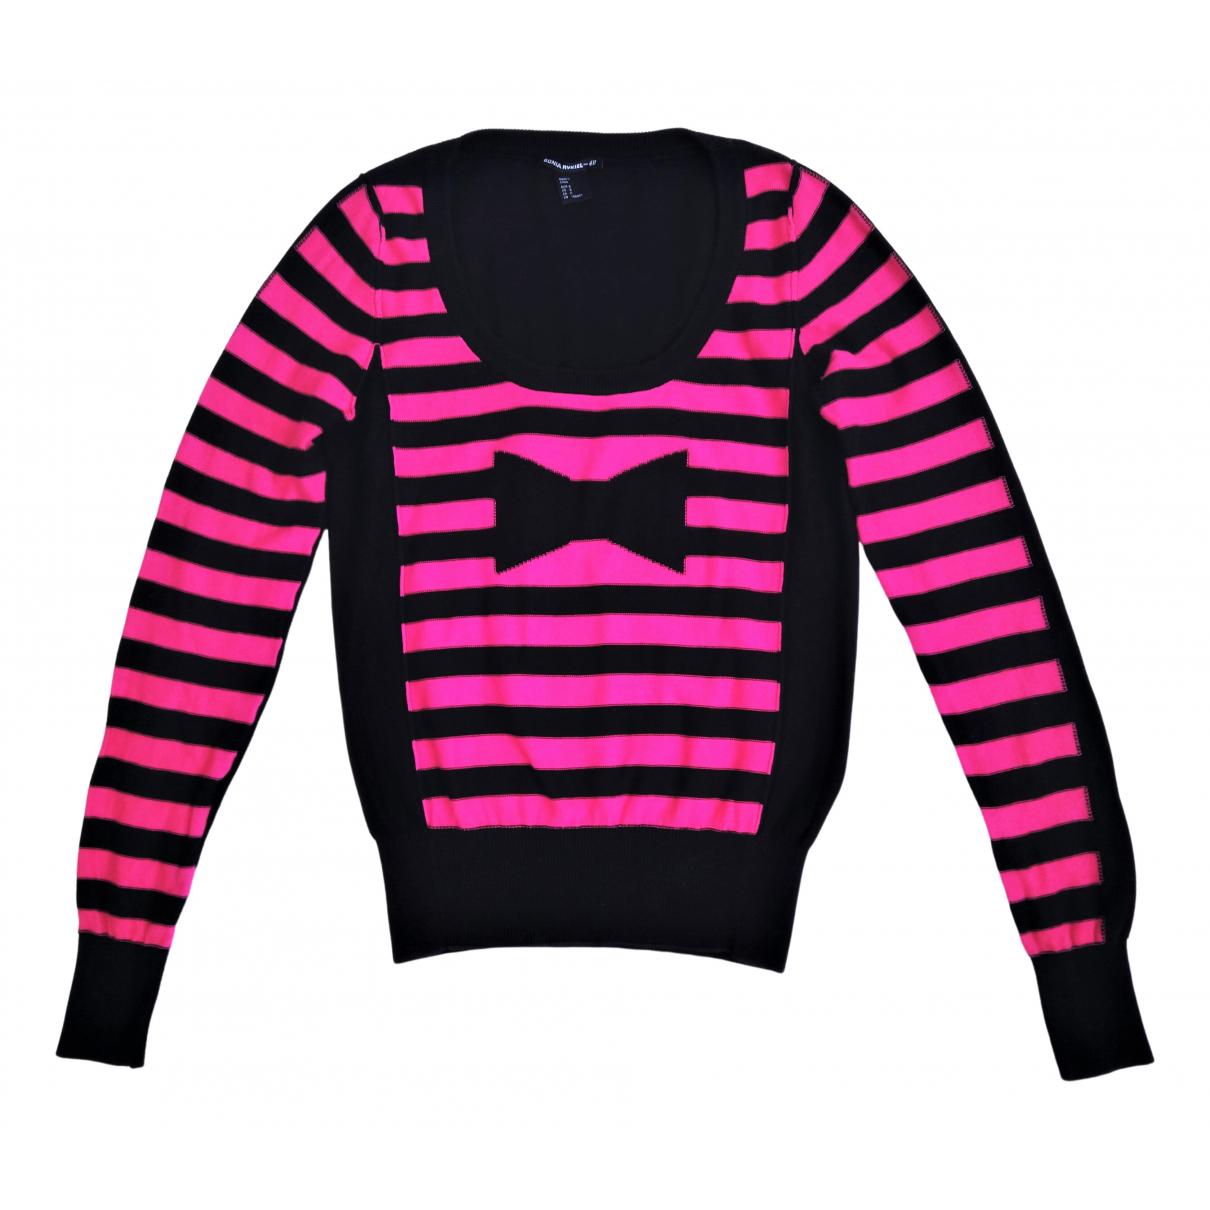 Sonia By Sonia Rykiel \N Multicolour Cotton Knitwear for Women S International